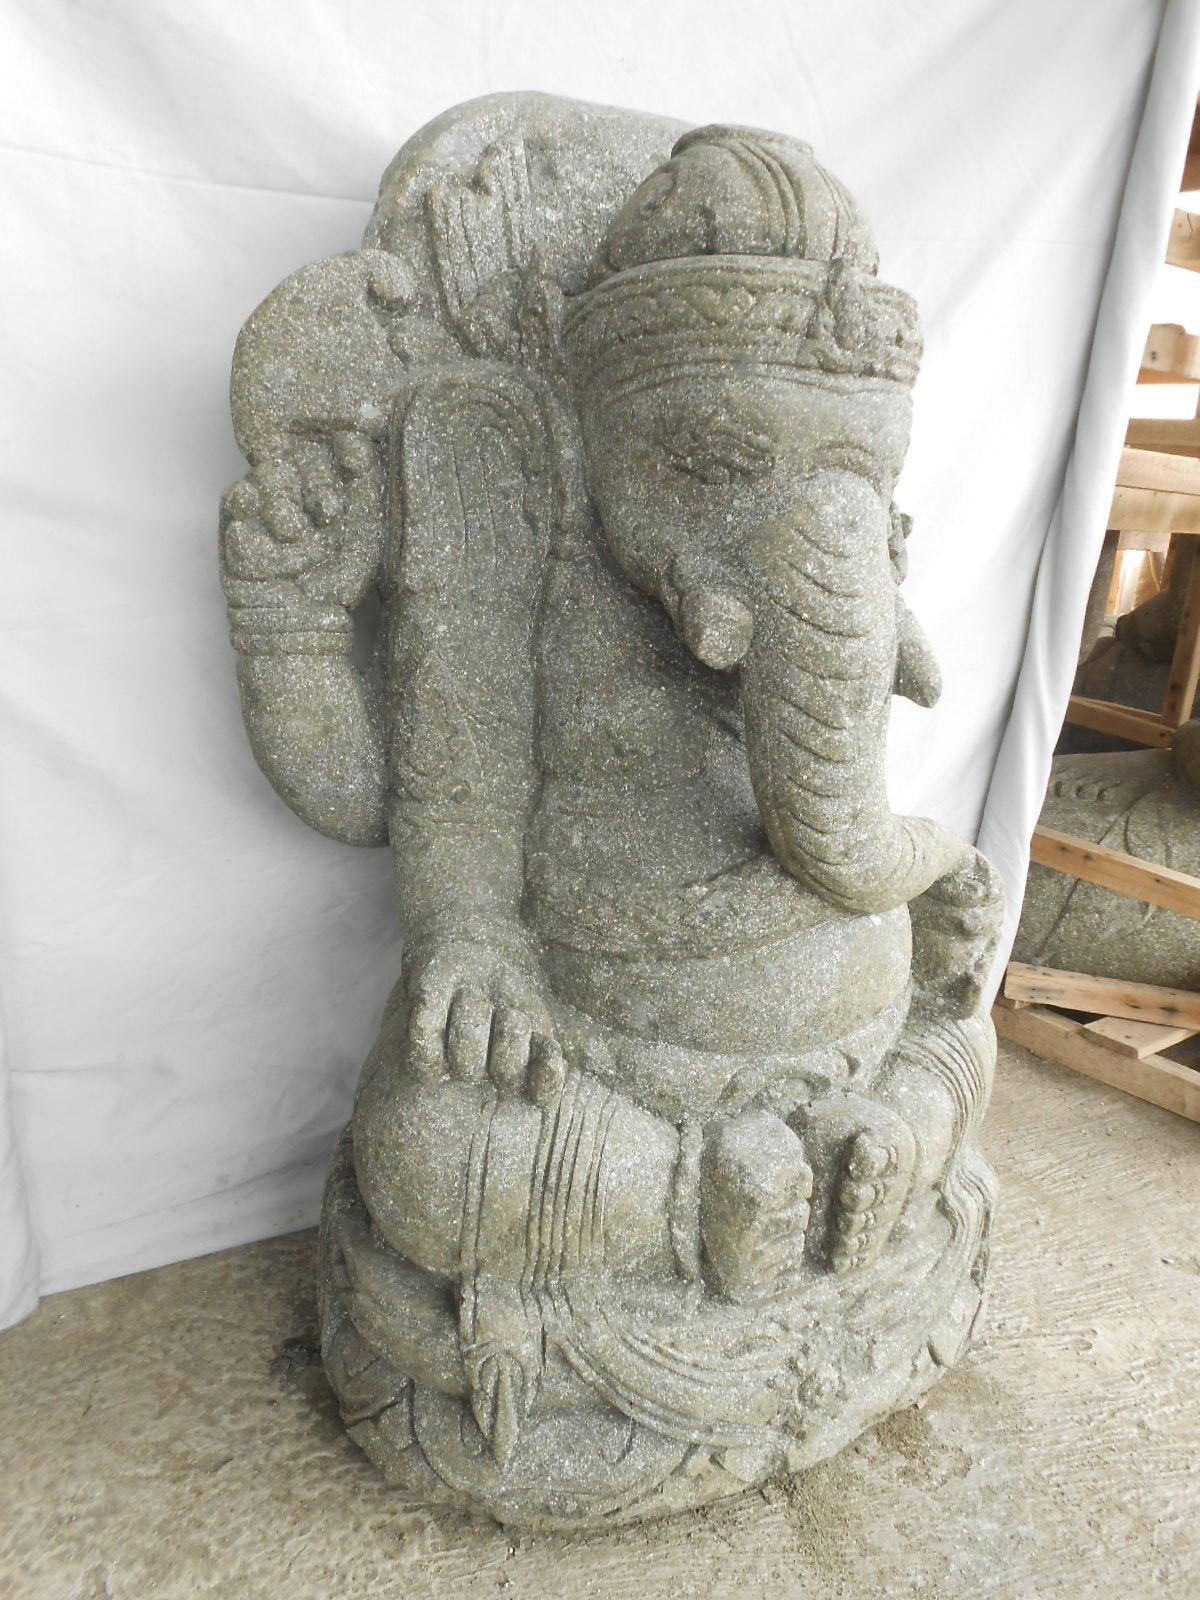 statue de jardin statue ganesh pierre de lave 80 cm. Black Bedroom Furniture Sets. Home Design Ideas